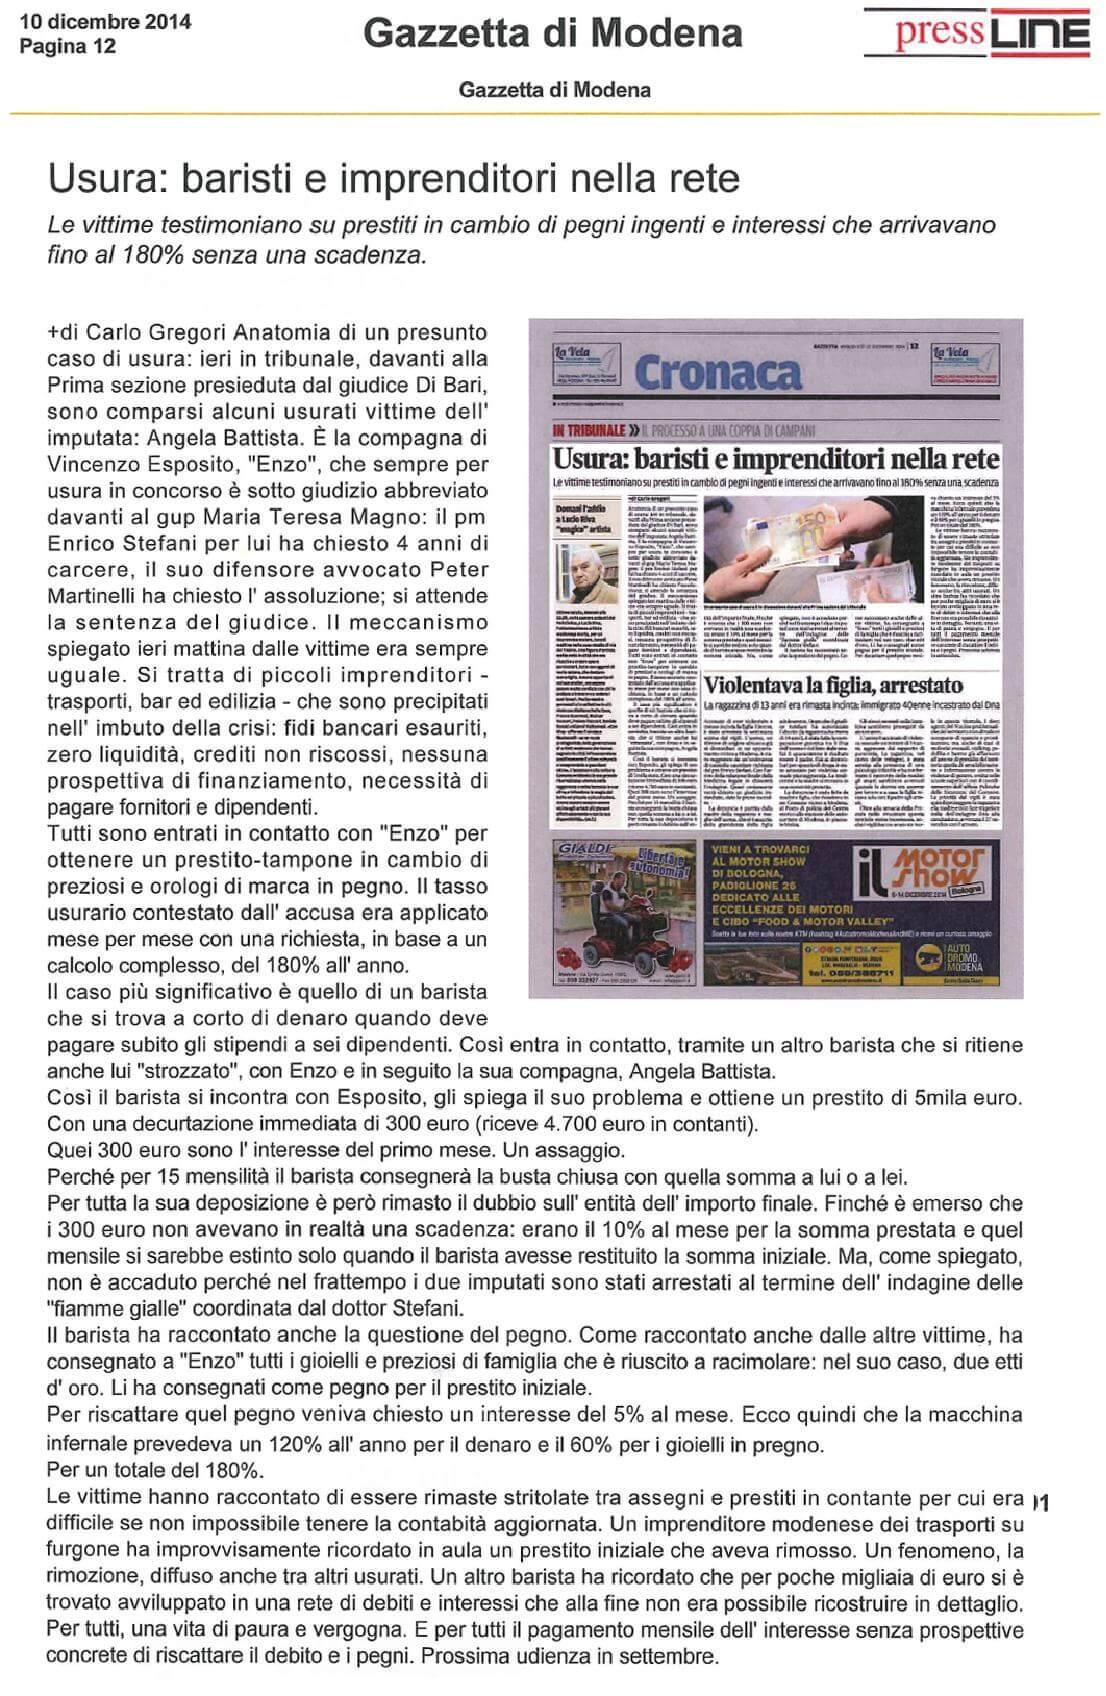 10_12_14_gdm_p12-page-001-1